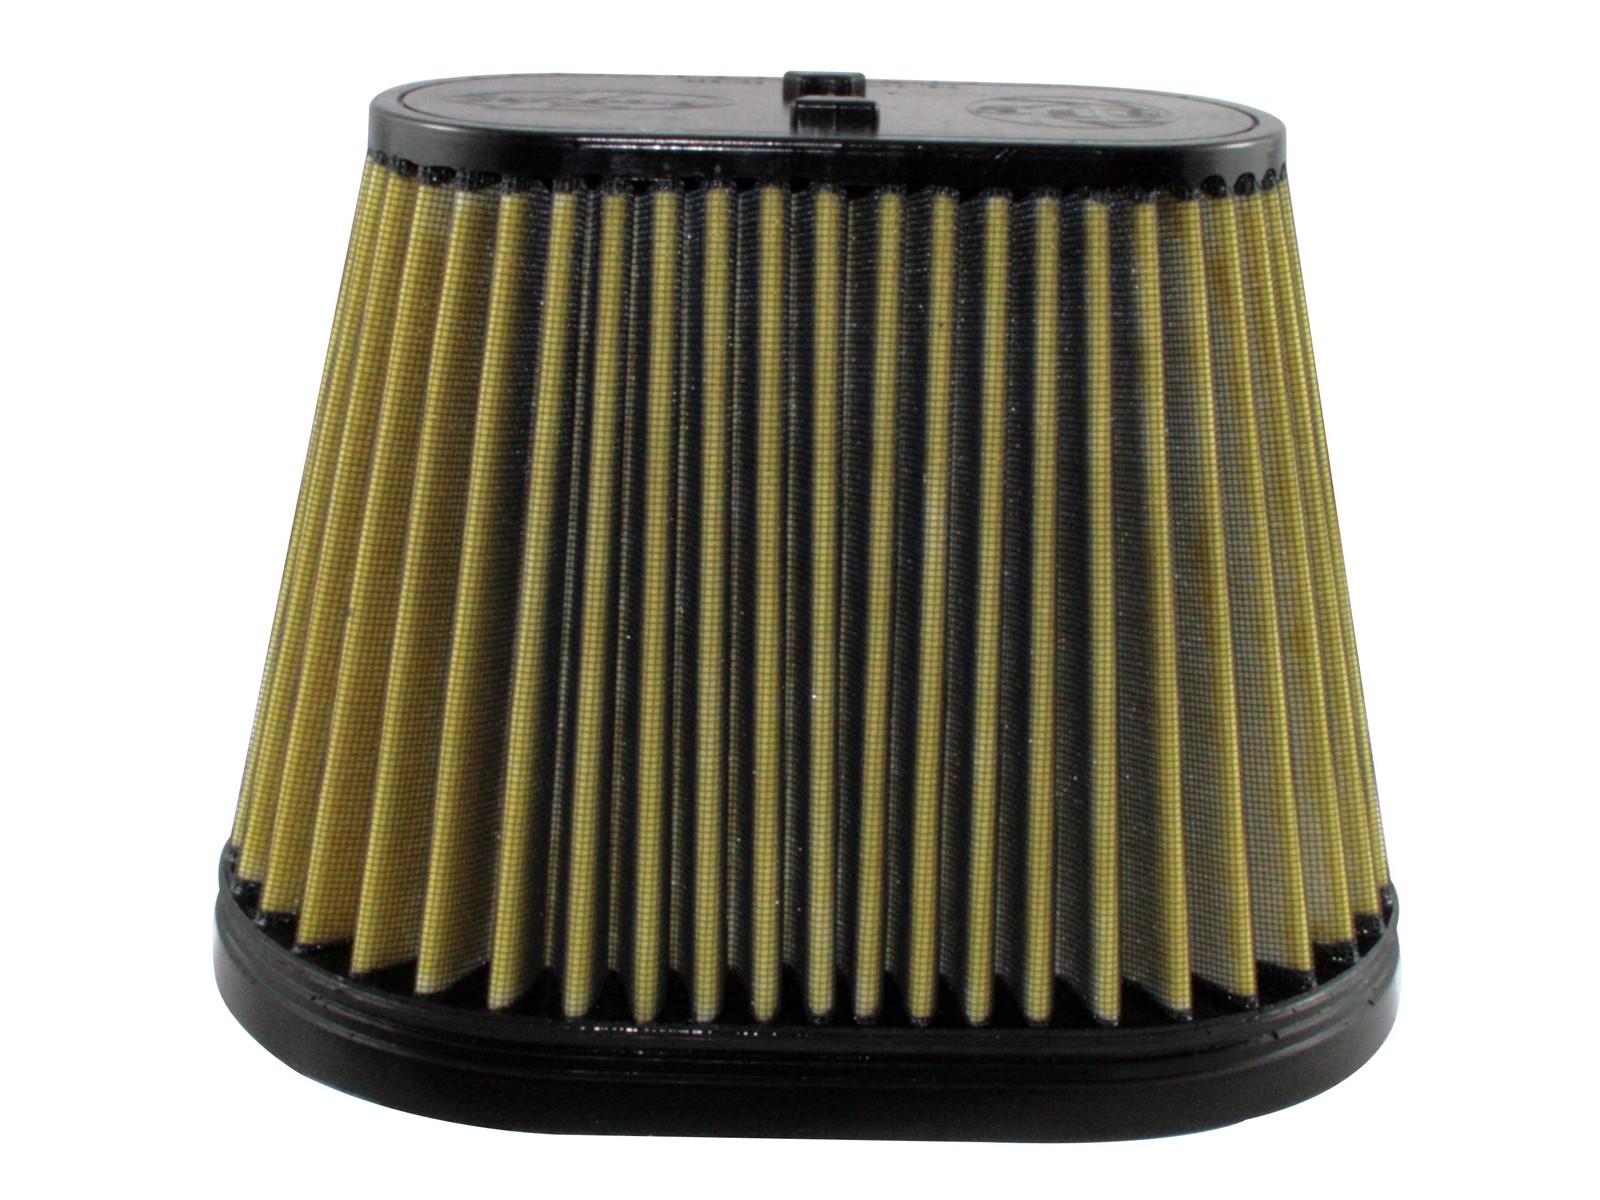 aFe POWER 71-10100 Magnum FLOW Pro GUARD7 Air Filter